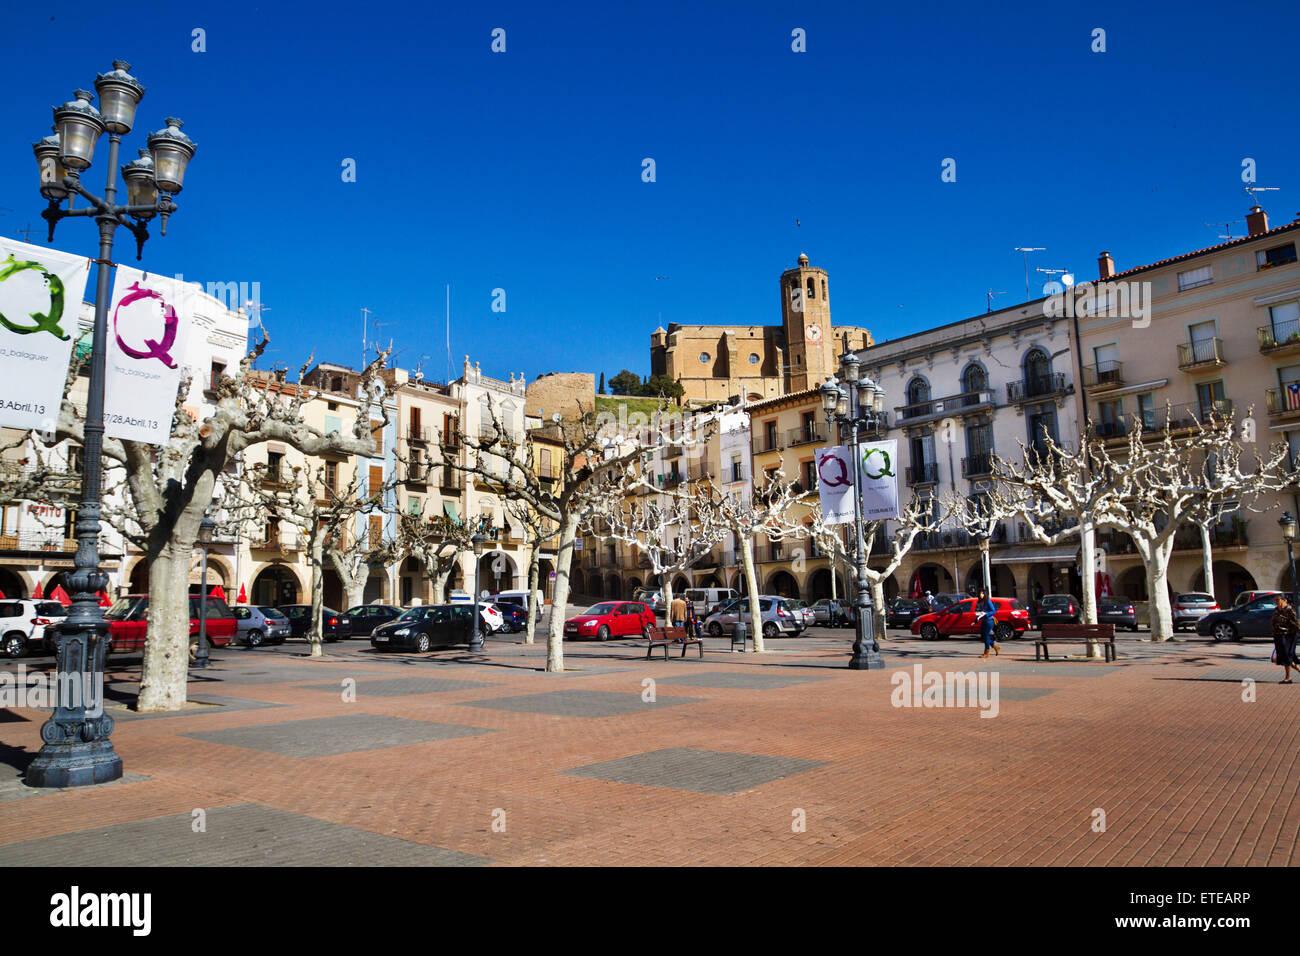 Mercadal square. XIV century. Santa Maria church. Balaguer, Nouguera county, Lleida province, Catalunya. - Stock Image